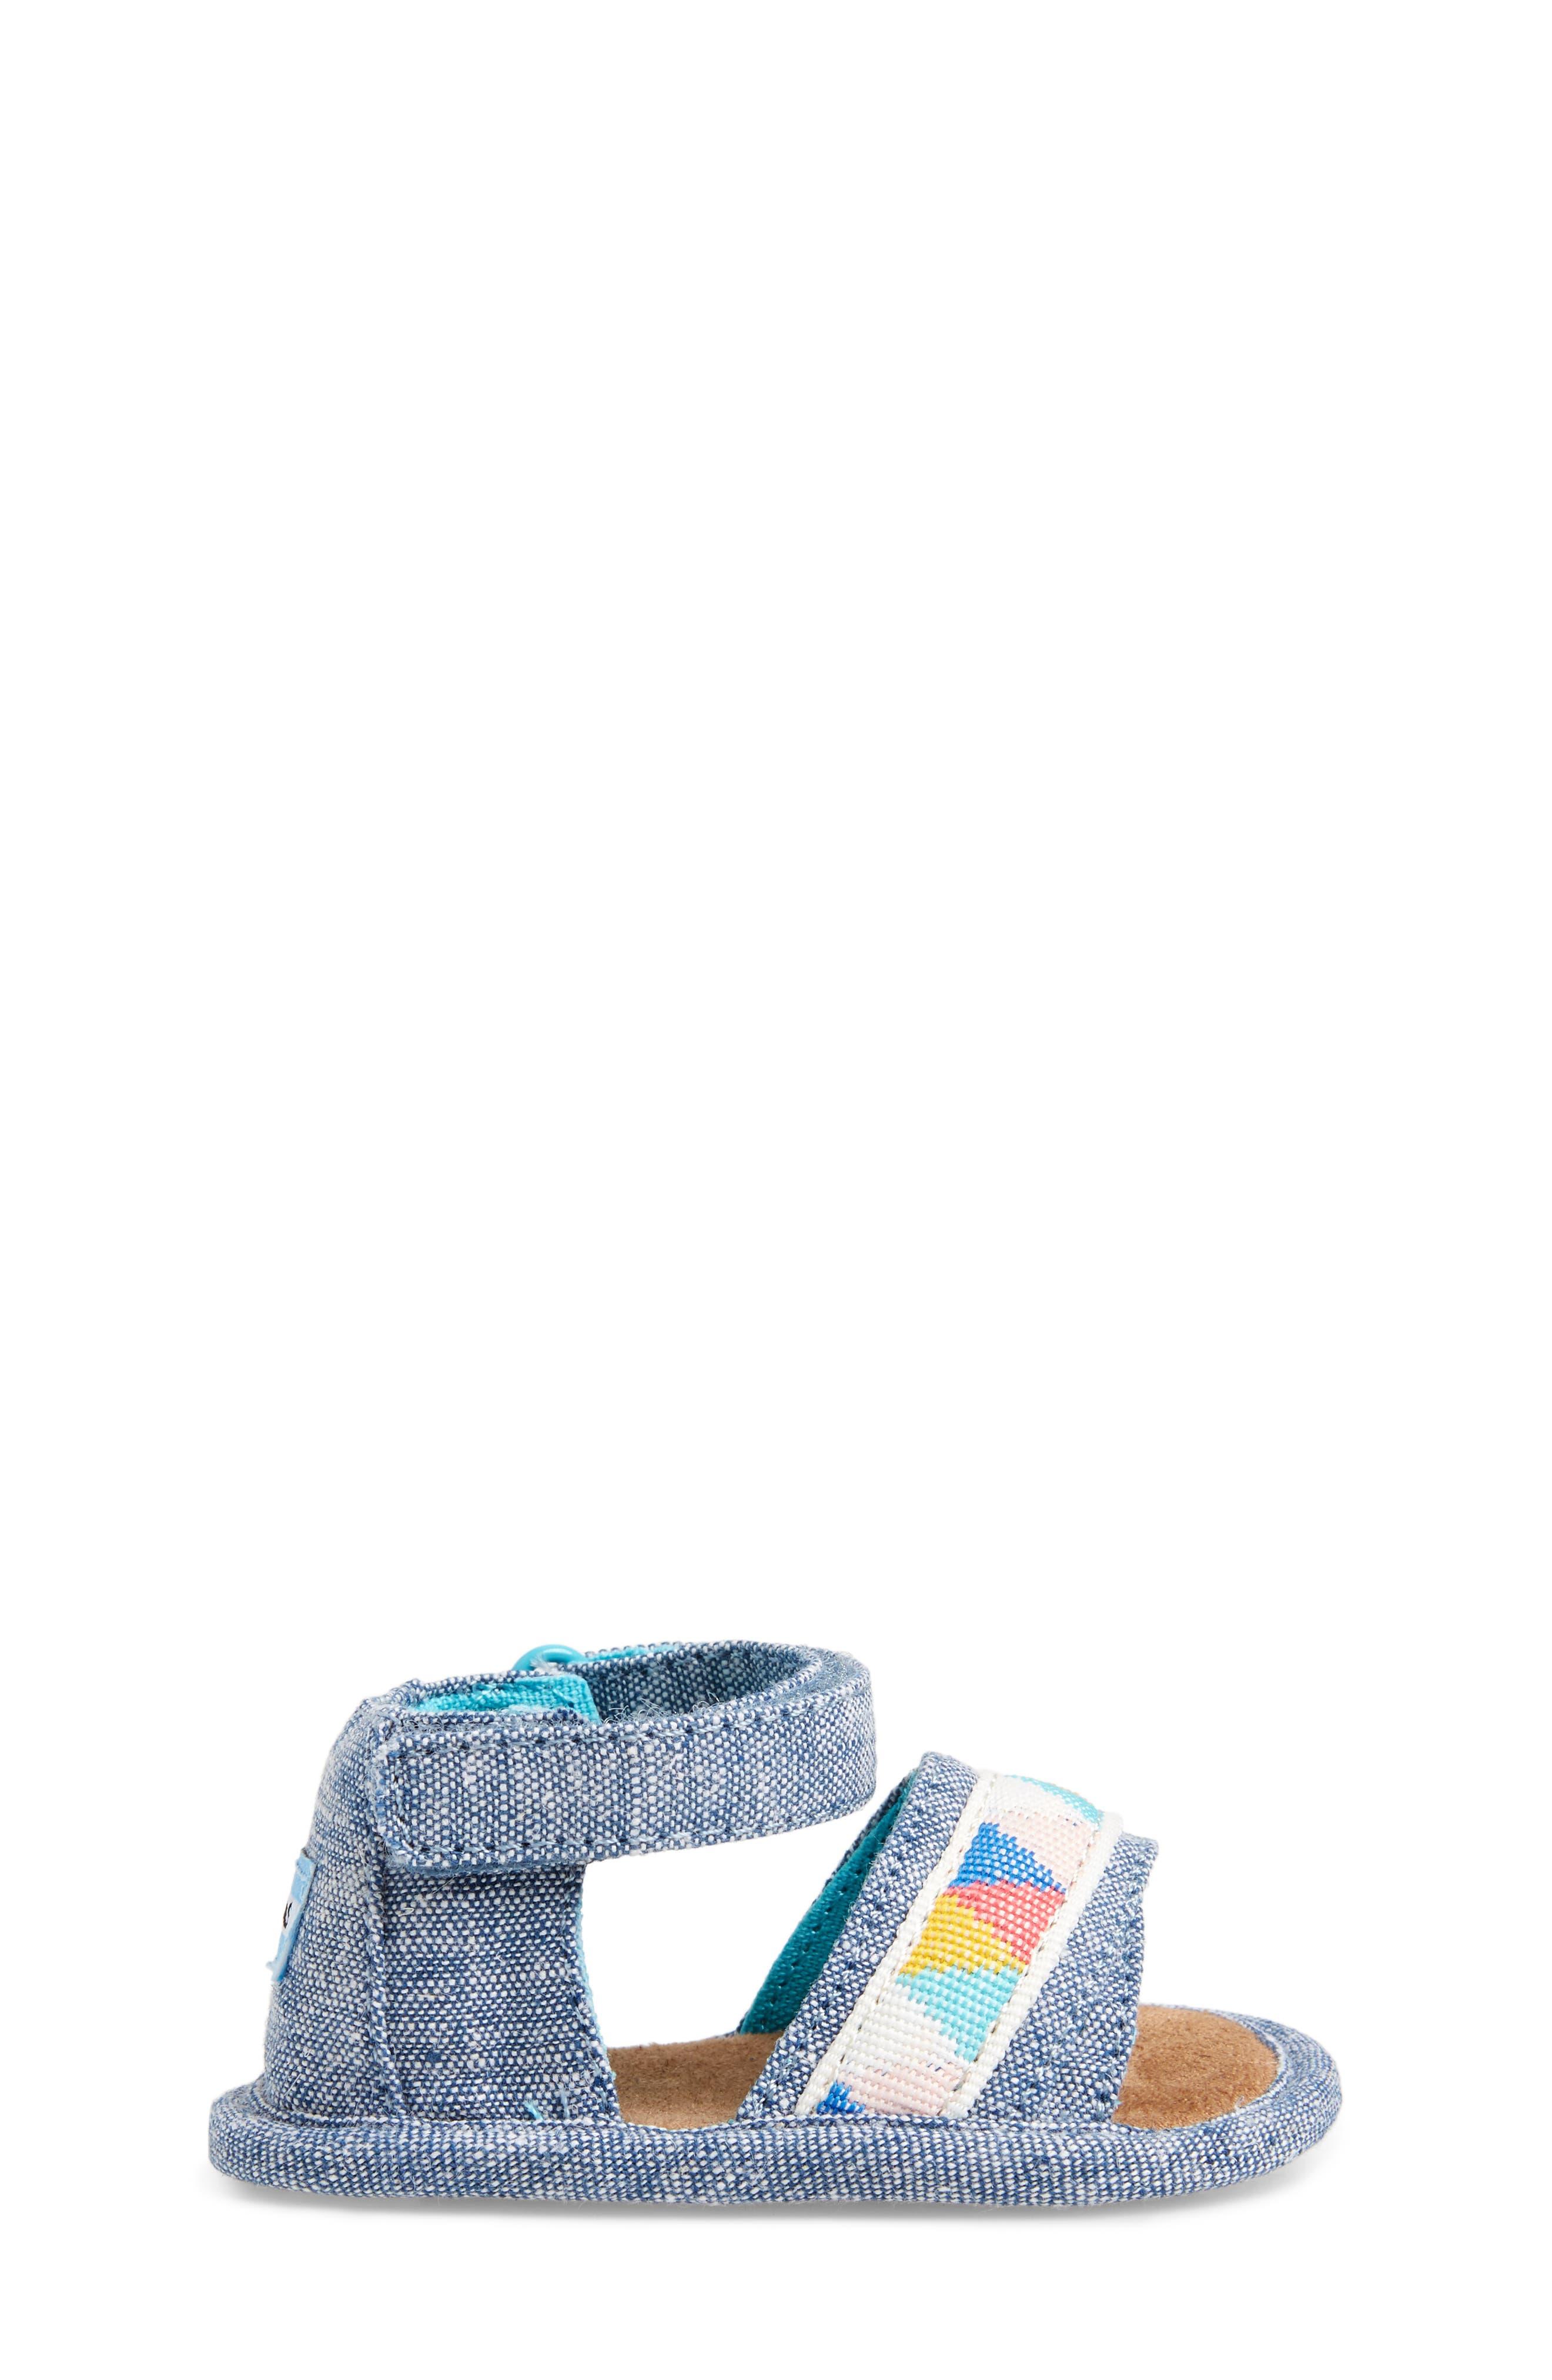 Alternate Image 3  - TOMS Shiloh Sandal (Baby)